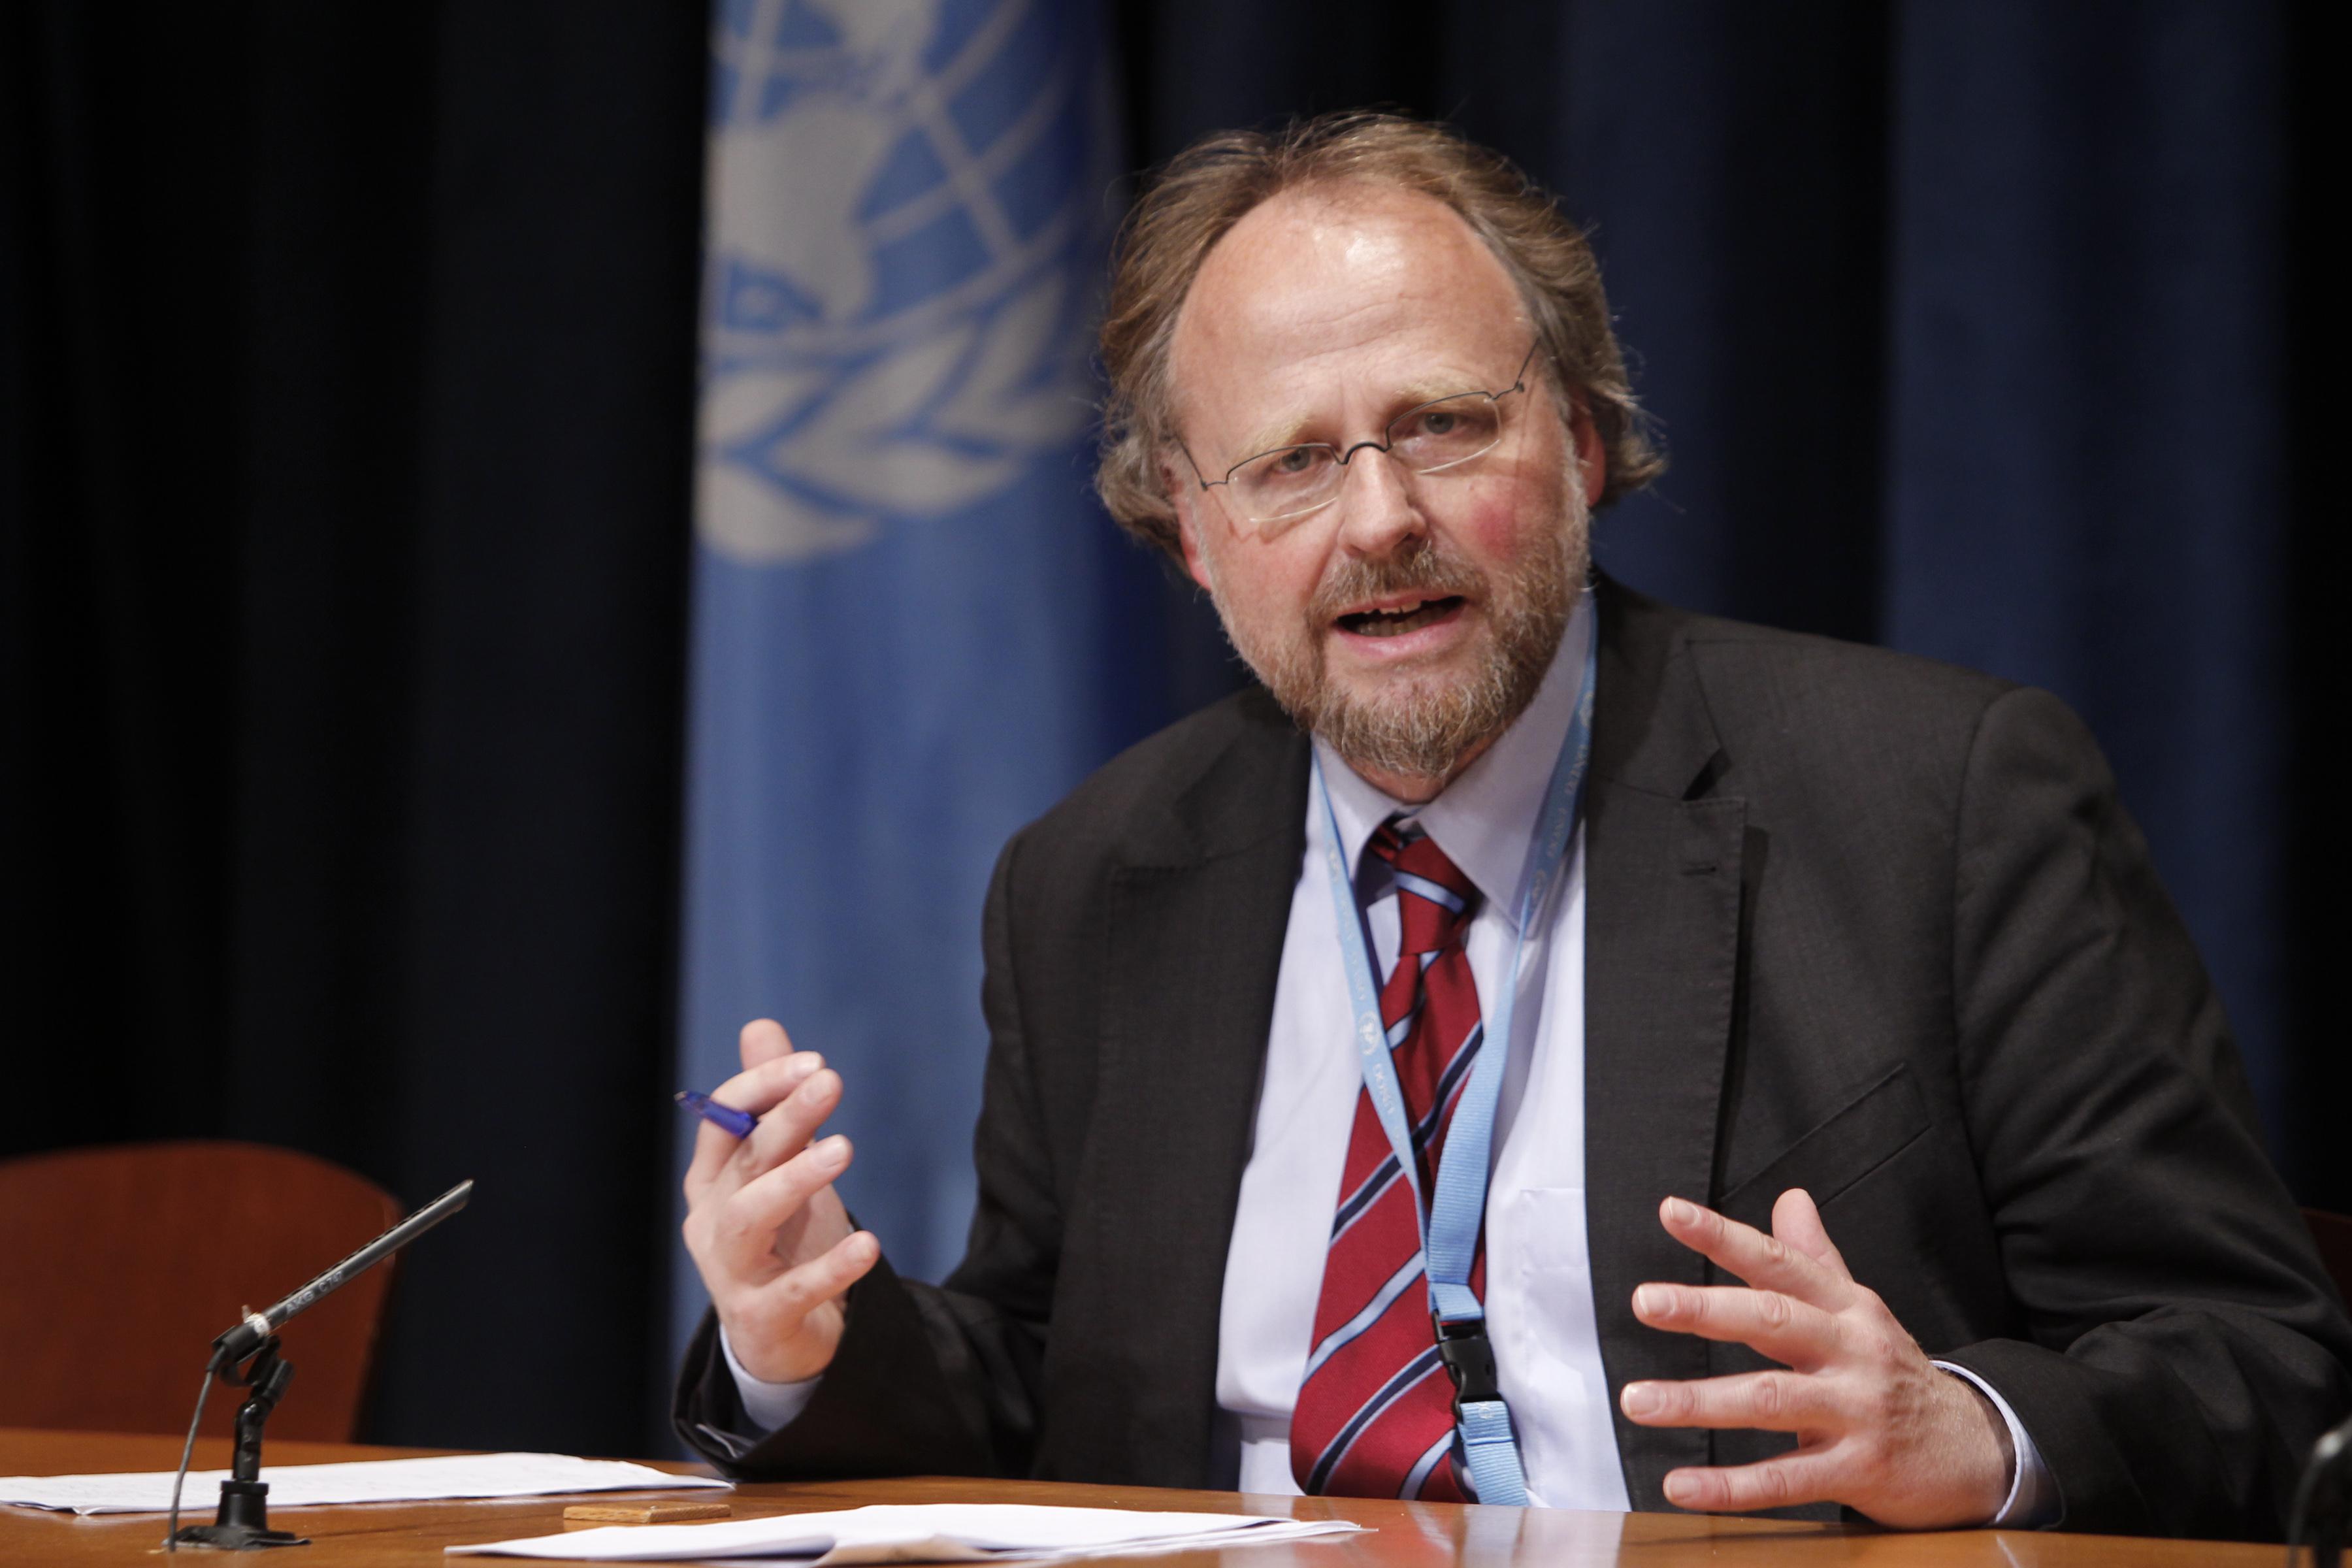 Mr. Heiner Bielefeldt, Special Rapporteur on freedom of religion or belief (Photo courtesy: UN Photo/Paulo Filgueiras)